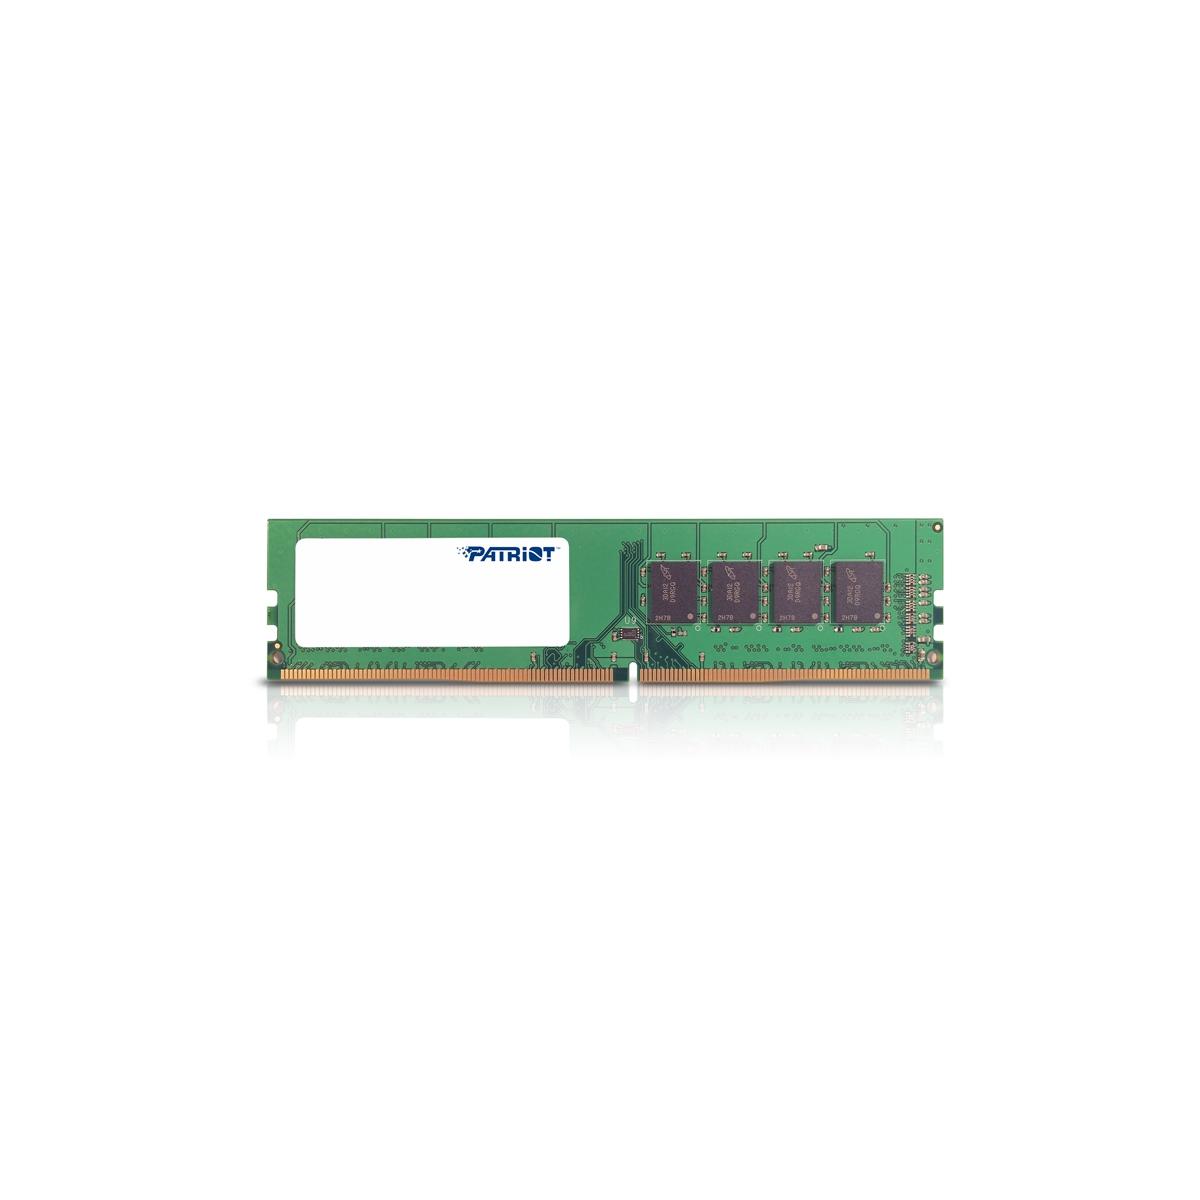 Patriot Signature Line 8GB DDR4-2400 DIMM PC4-19200 CL17, 1.2V